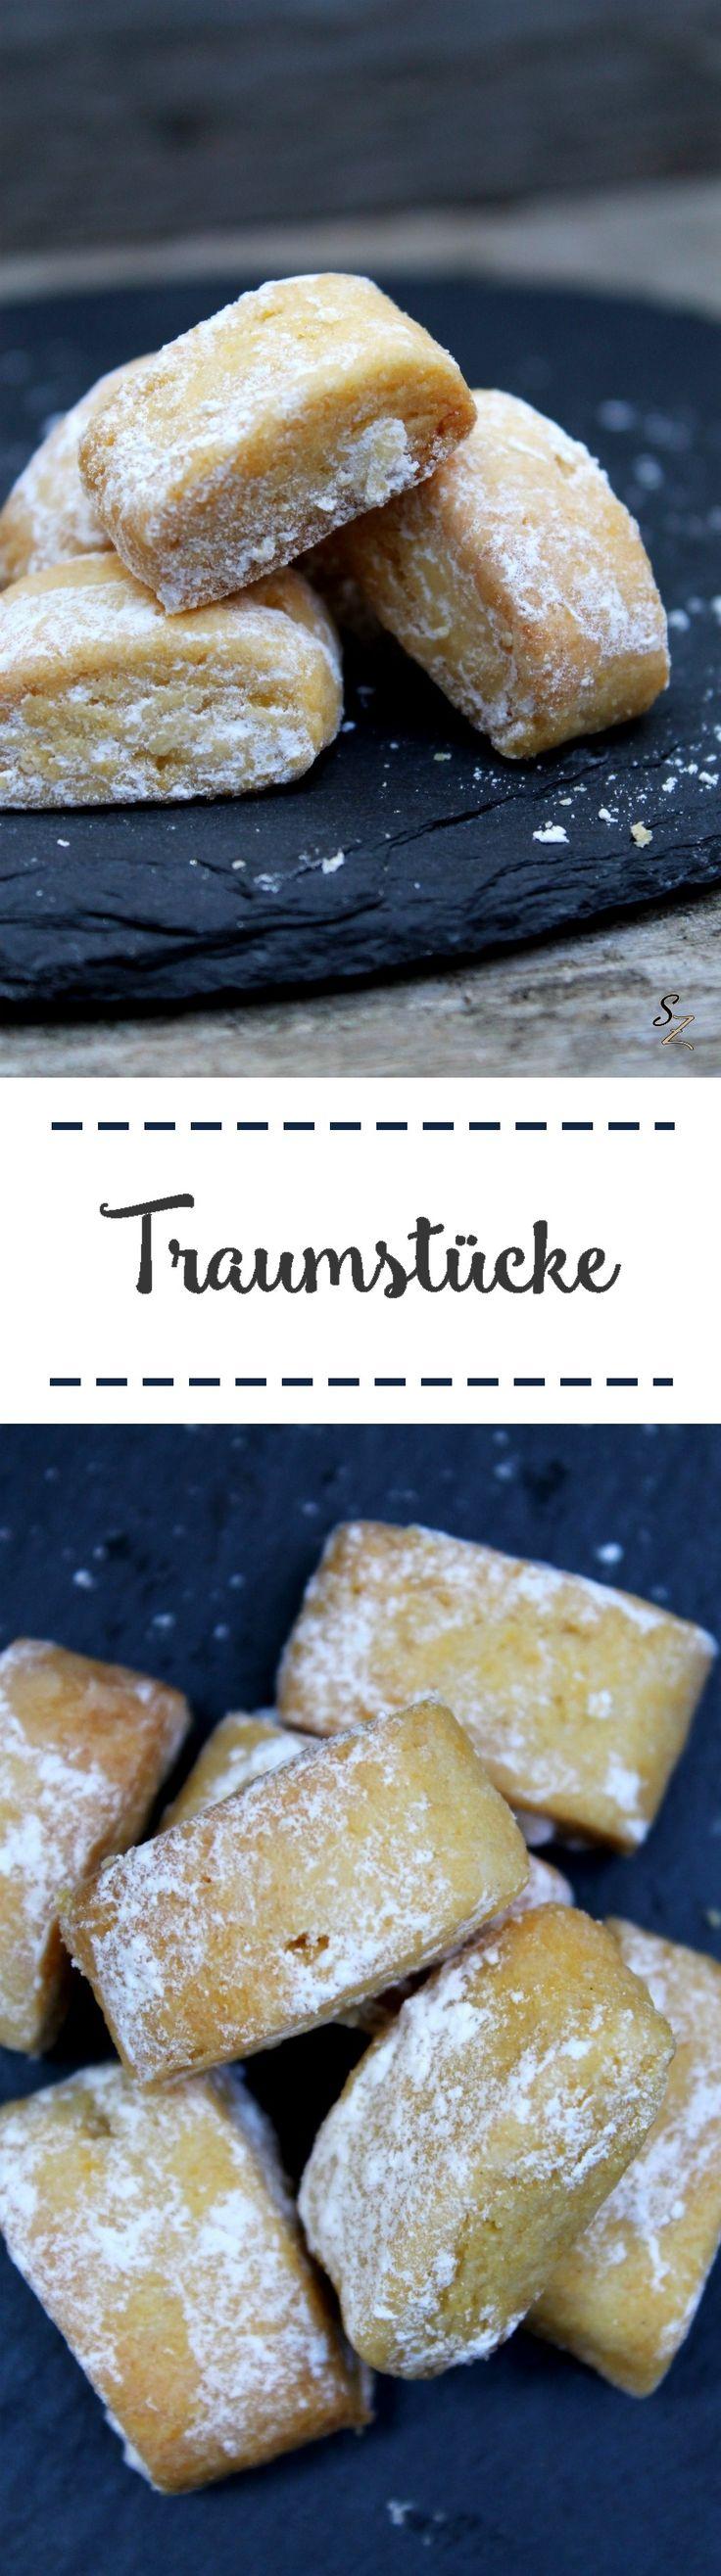 Traumstücke (Baking Pasta Recipes)